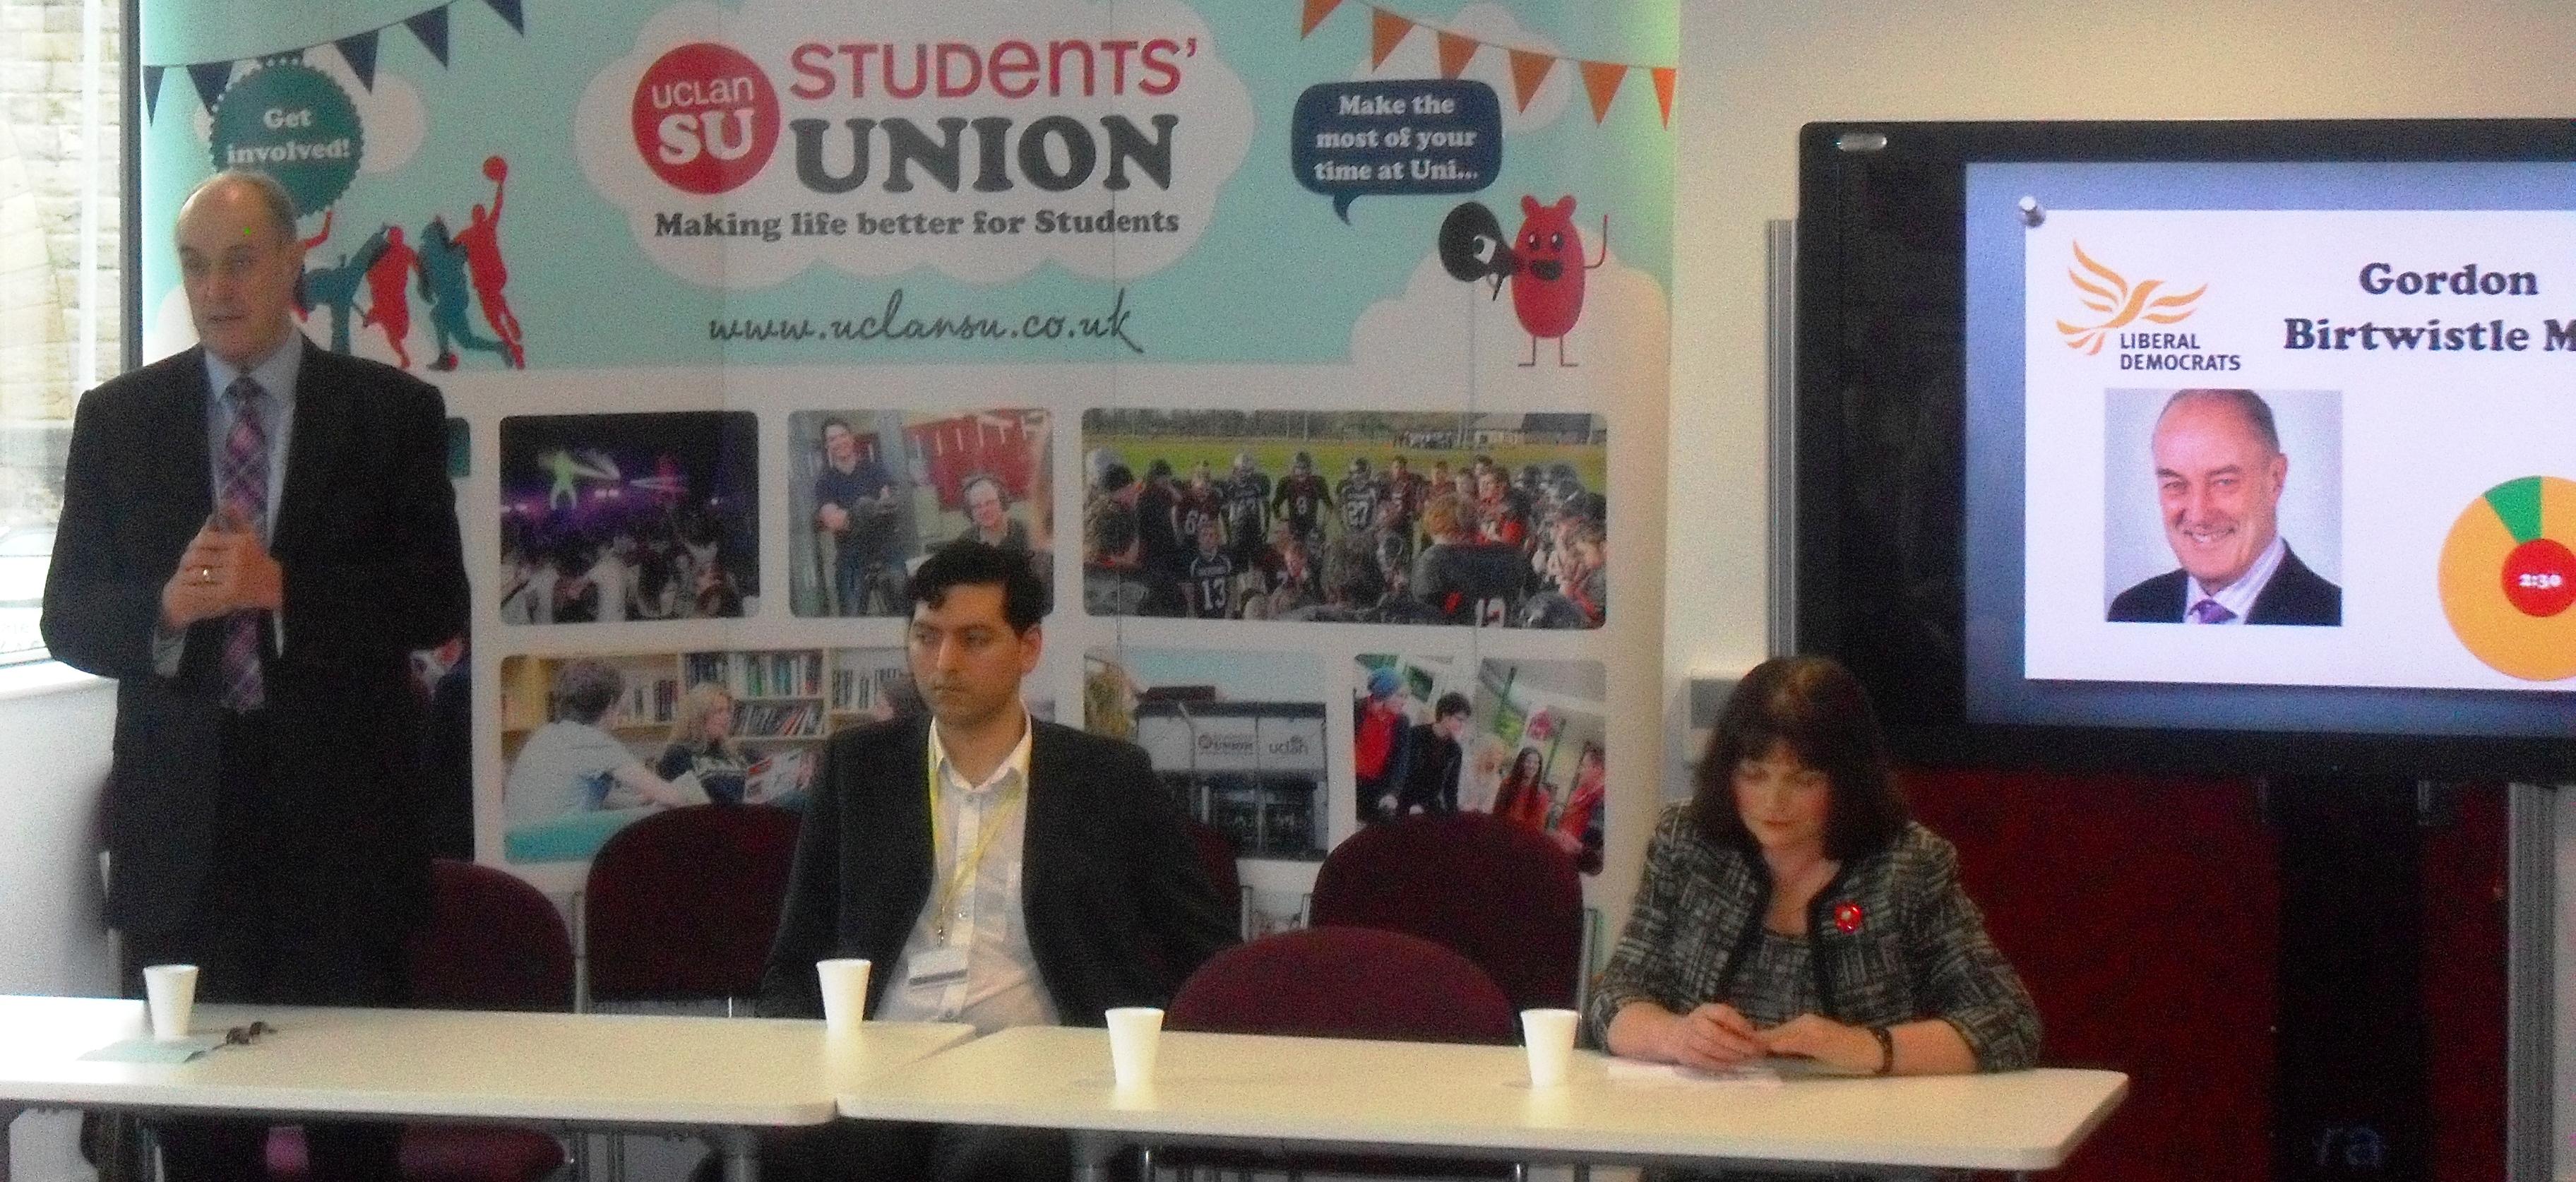 studentdebate.JPG